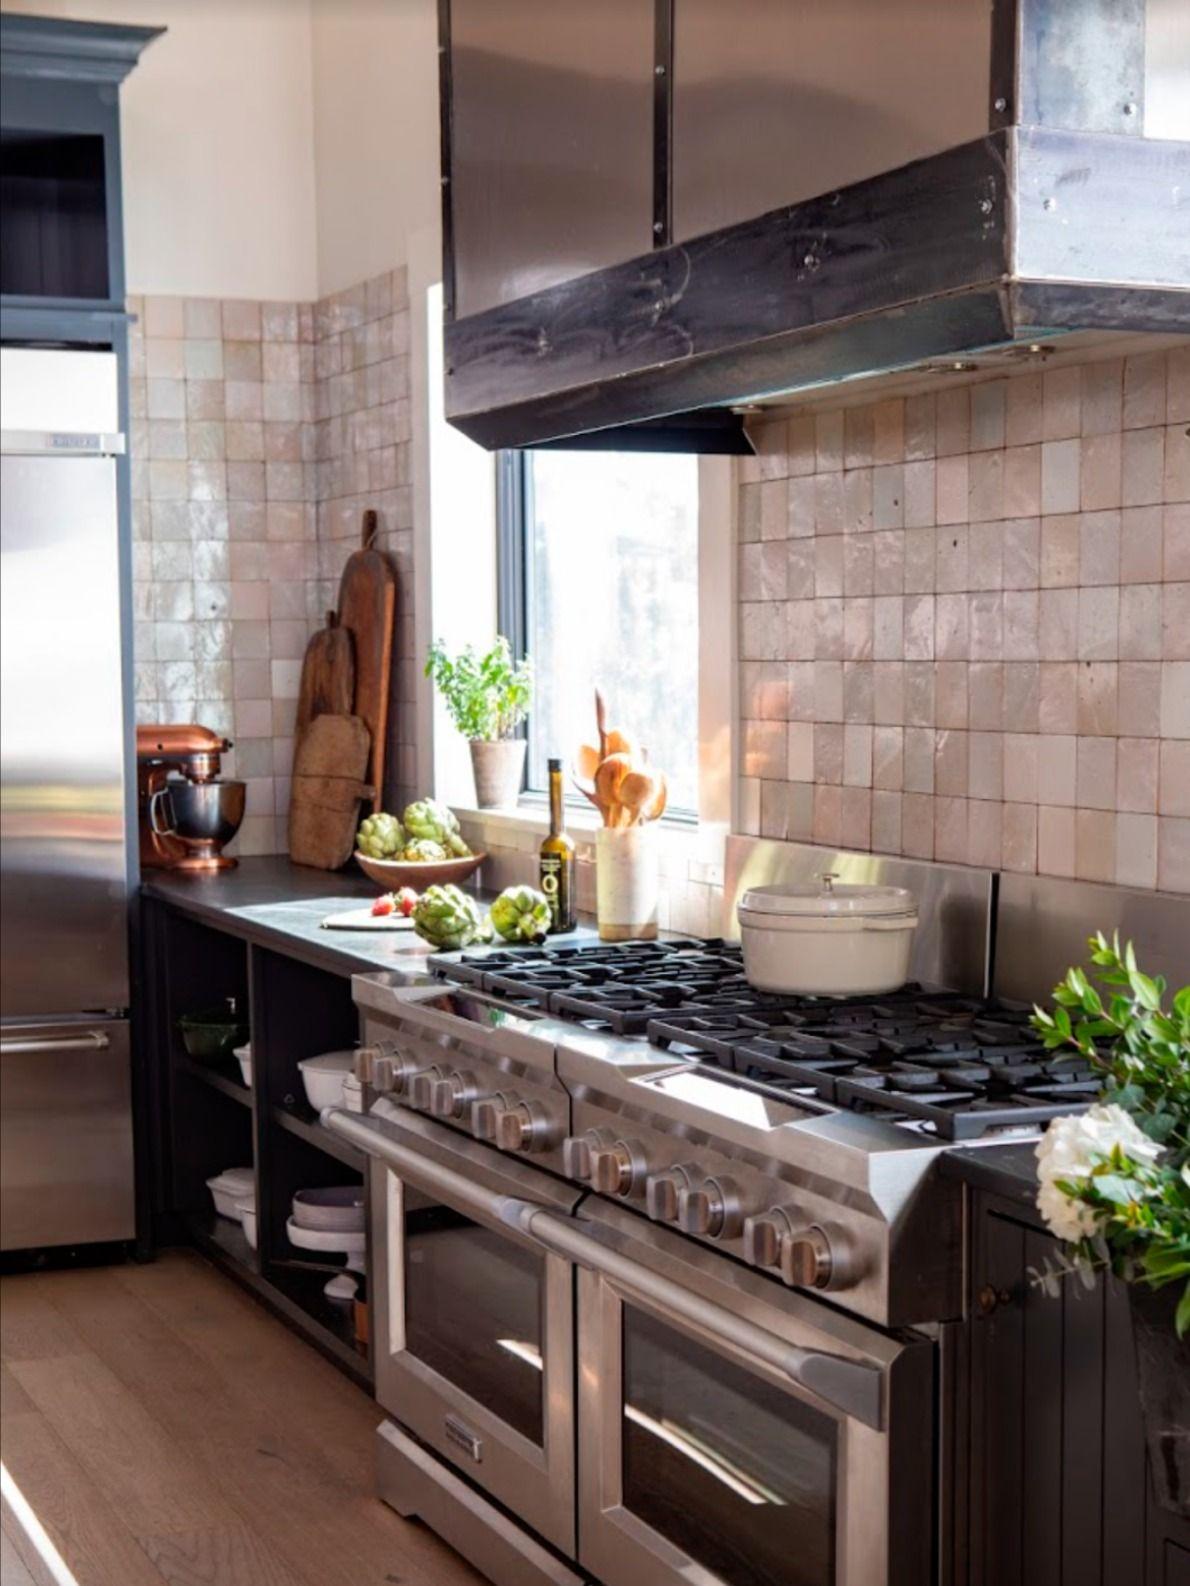 Pin On Cle Kitchen Backsplash Tiles